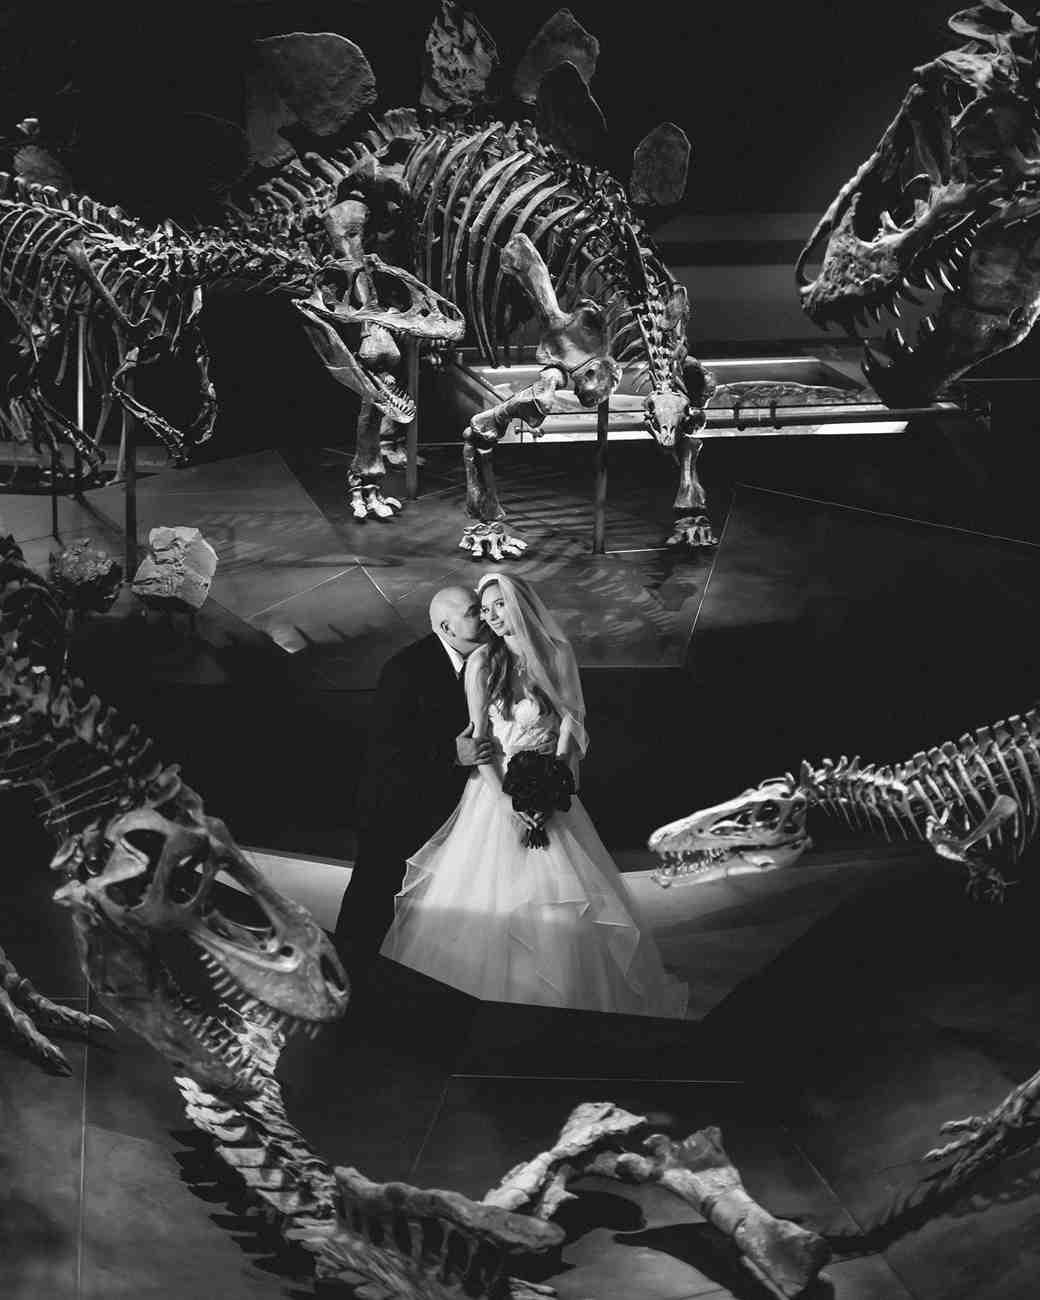 duff goldman johnna colbry dinosaur room photo